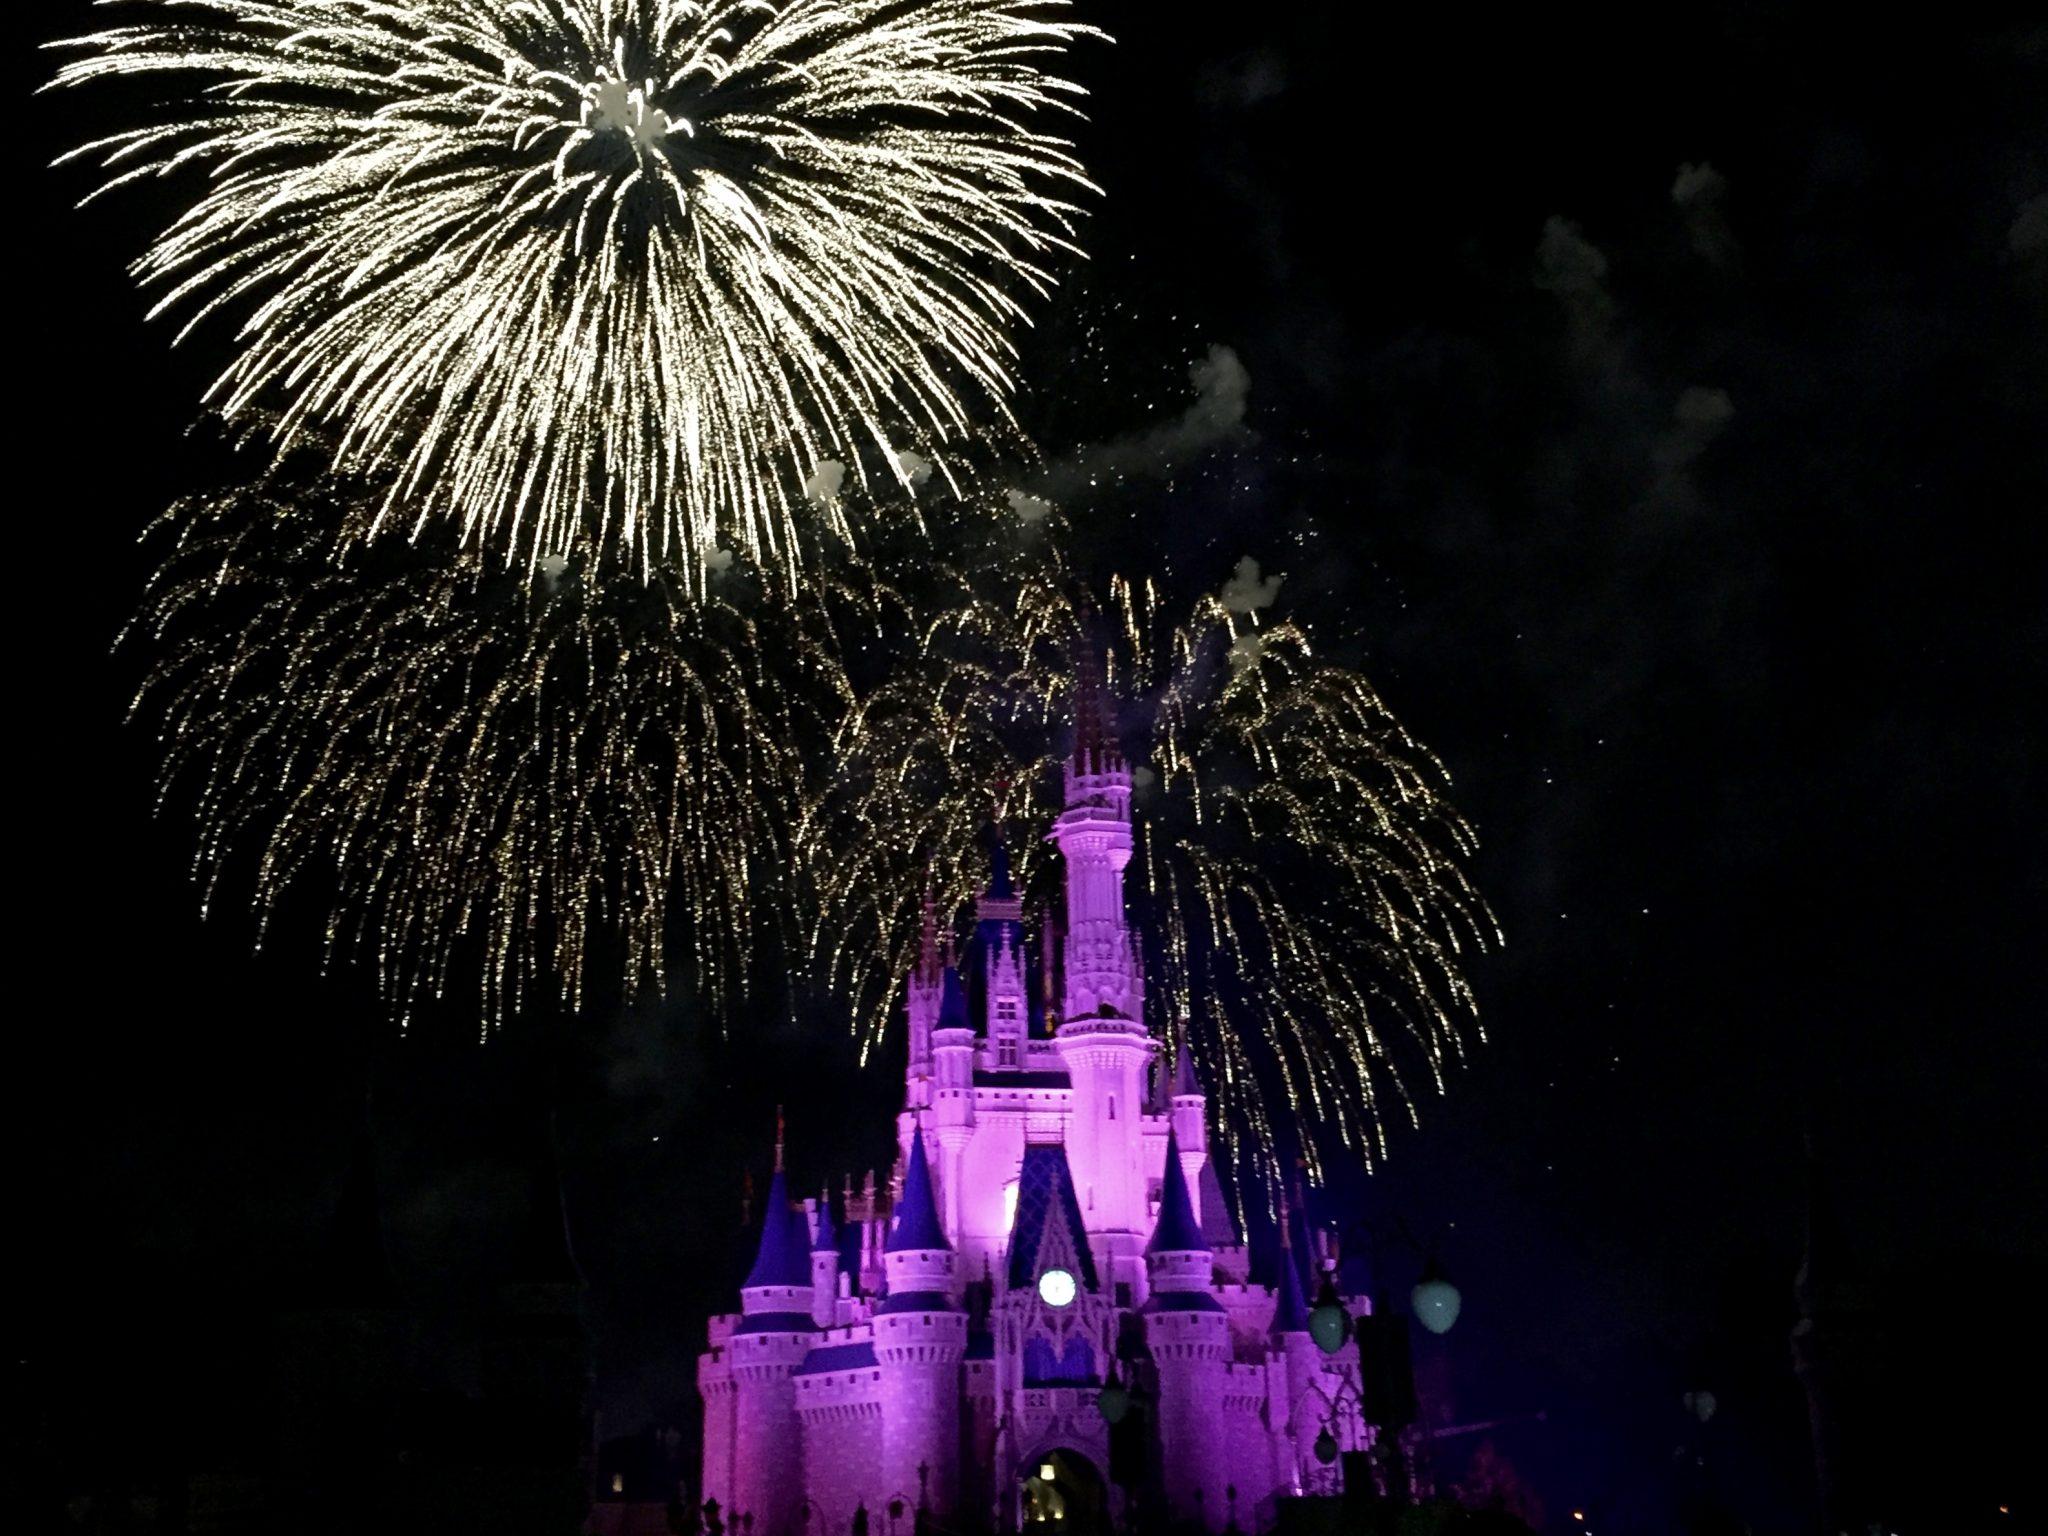 disneyworld, cinderella castle, fireworks